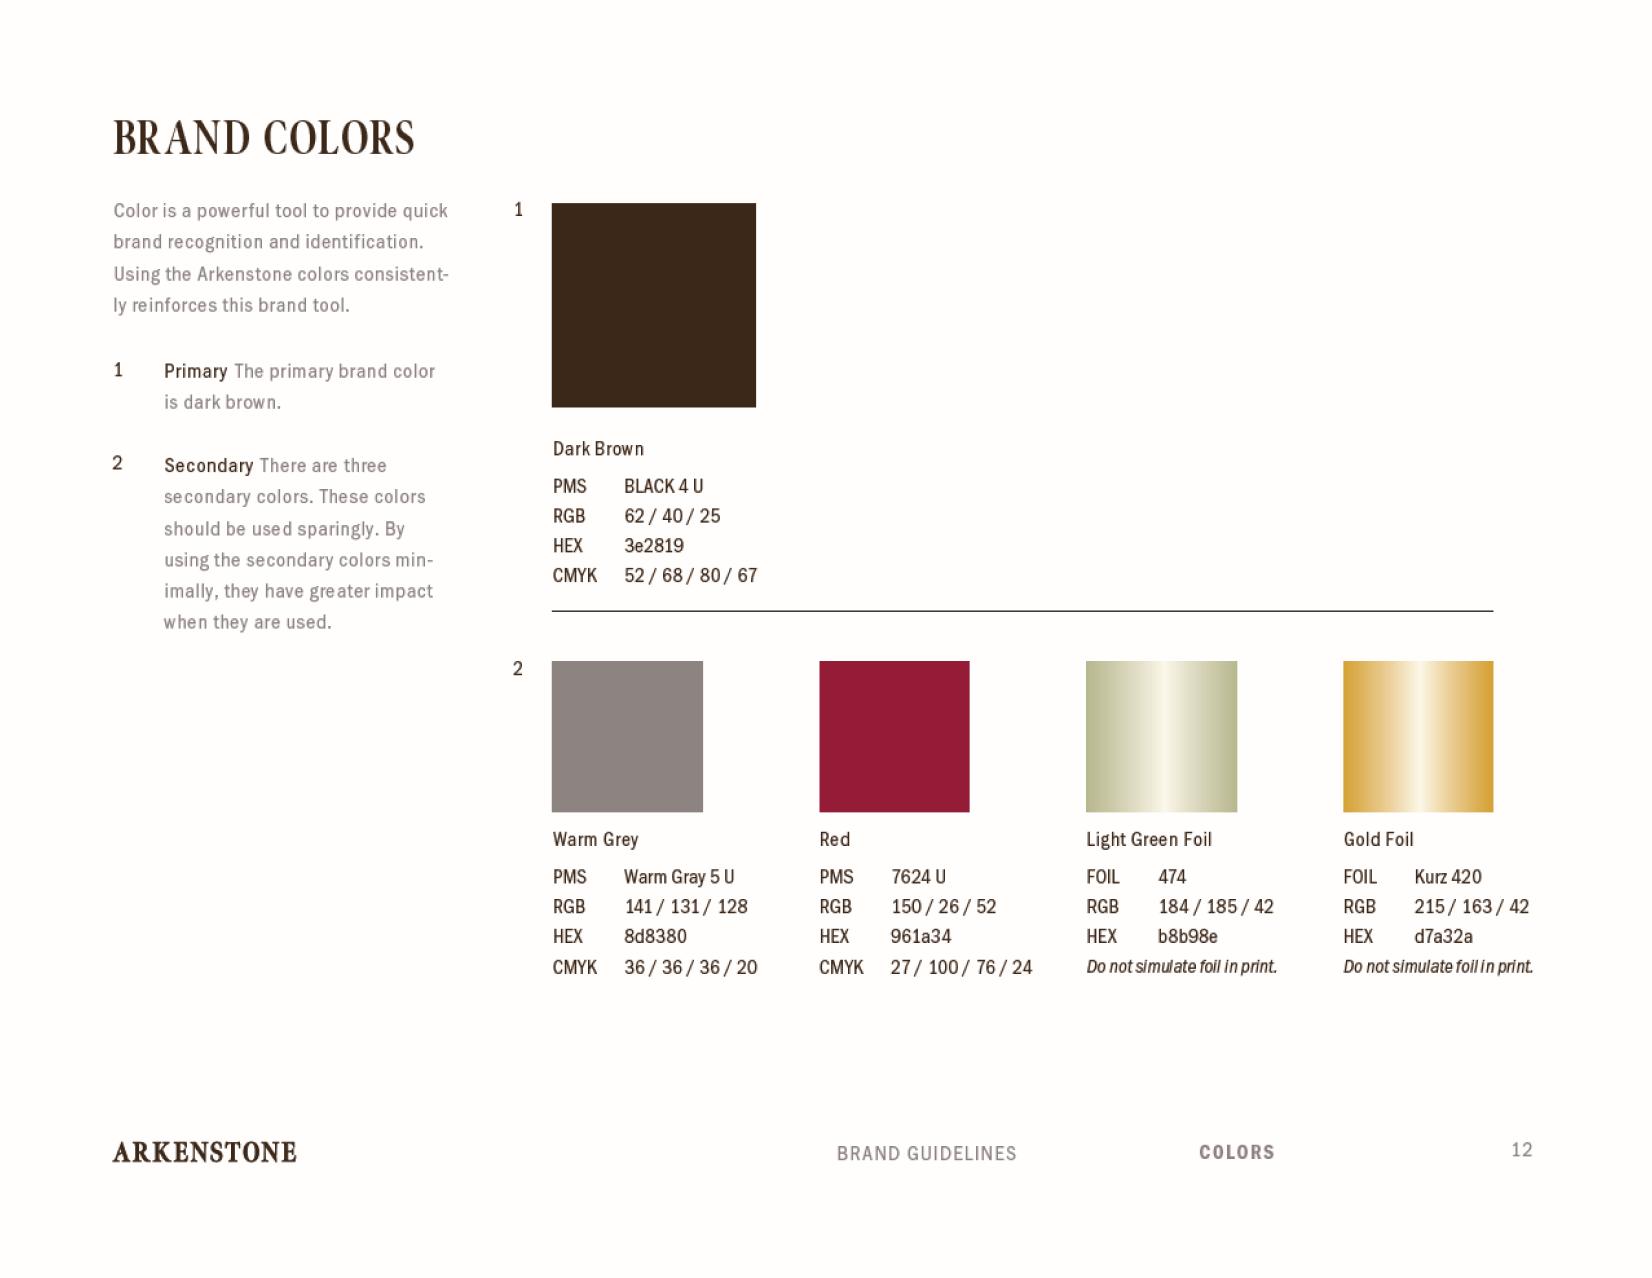 Arkenstone brand standards colors